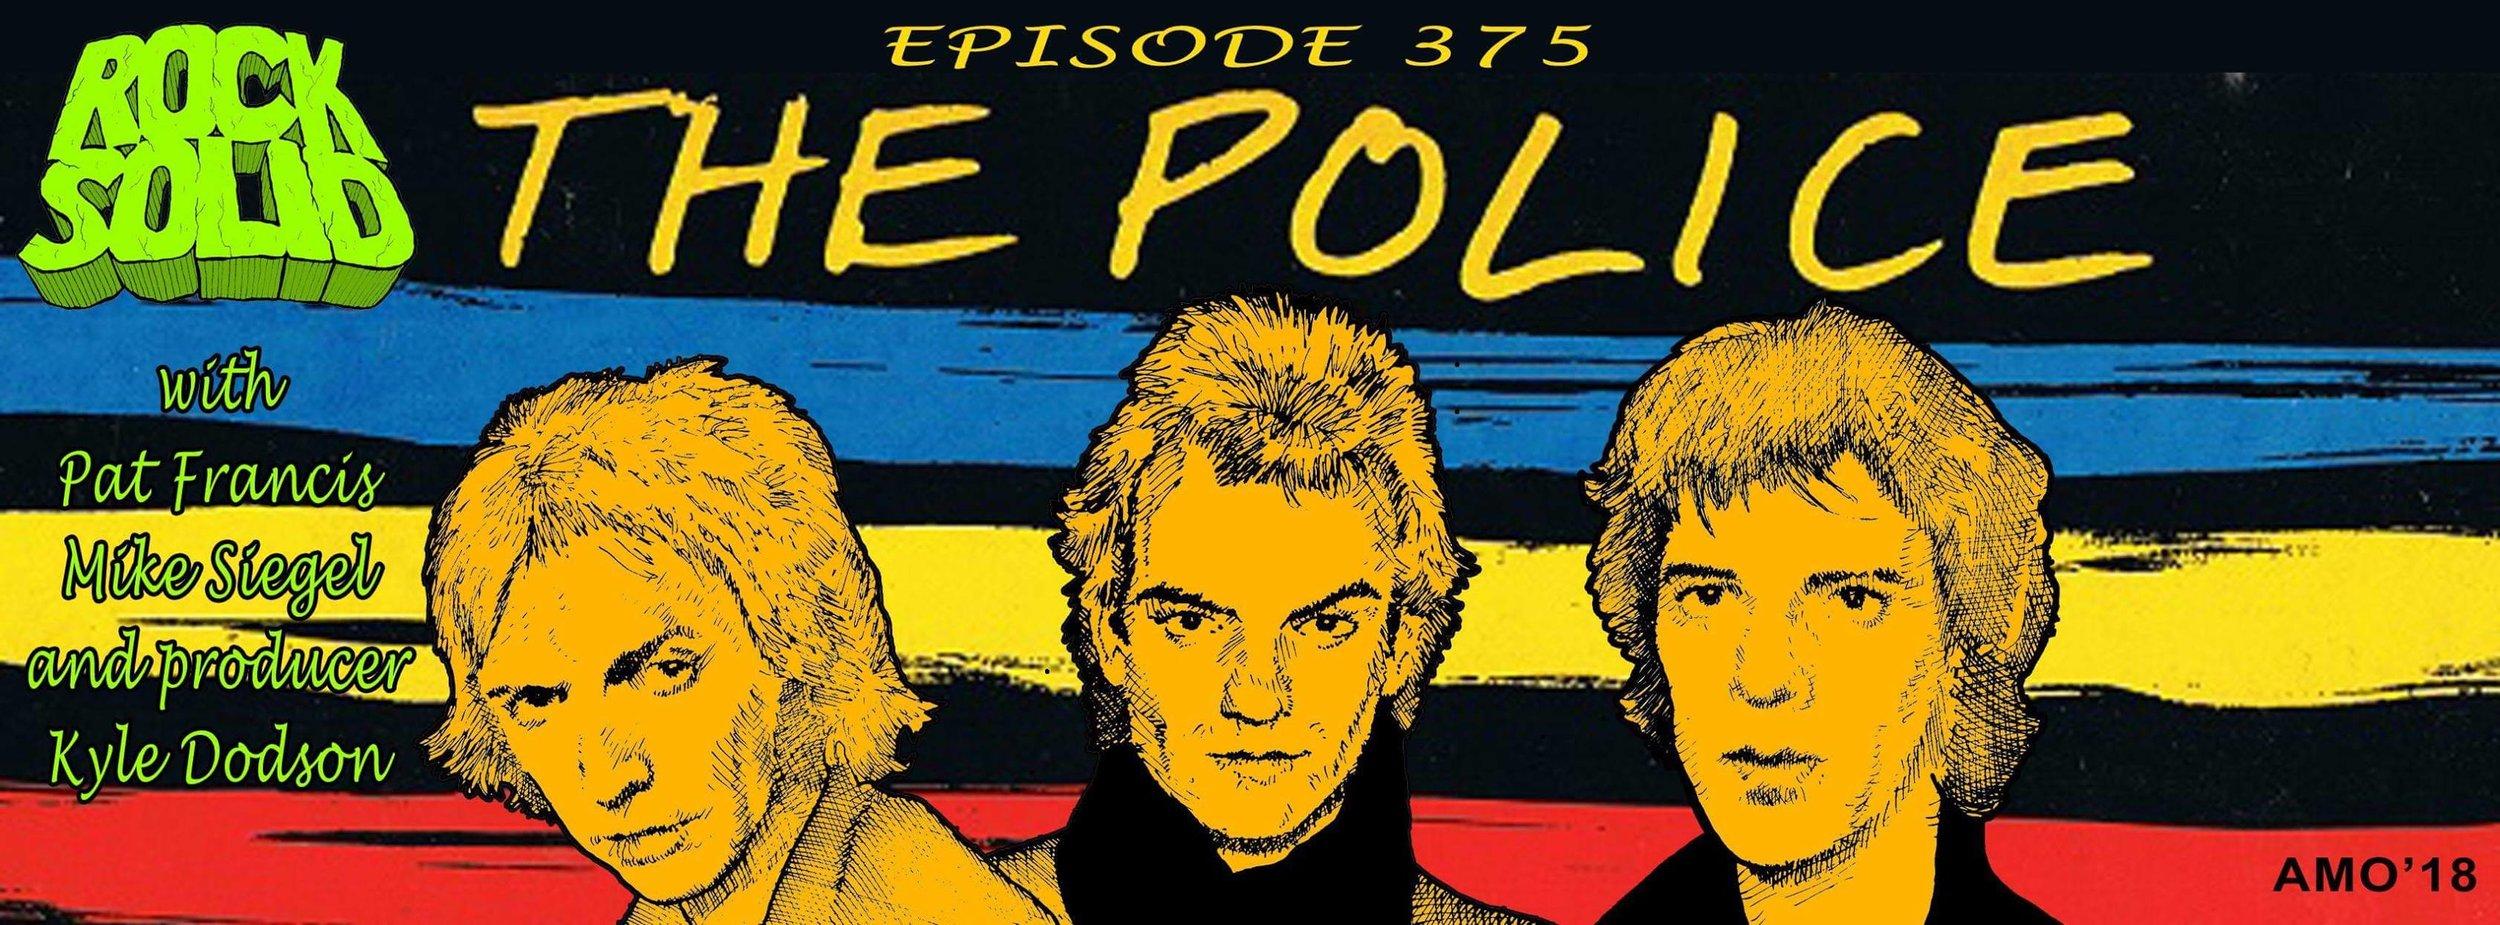 rs police.jpg